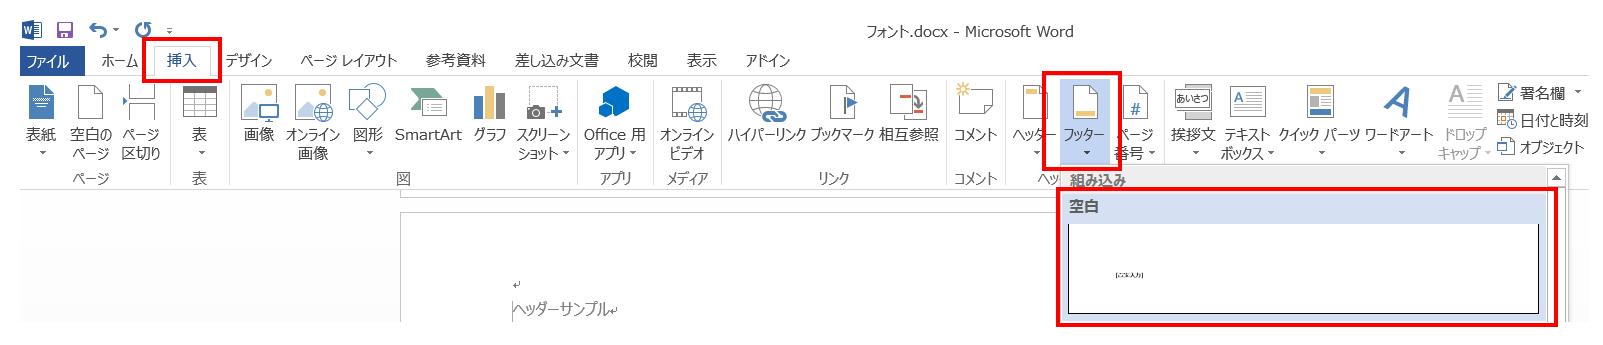 2016-02-27 23_40_08-Book1.xlsx - Microsoft Excel